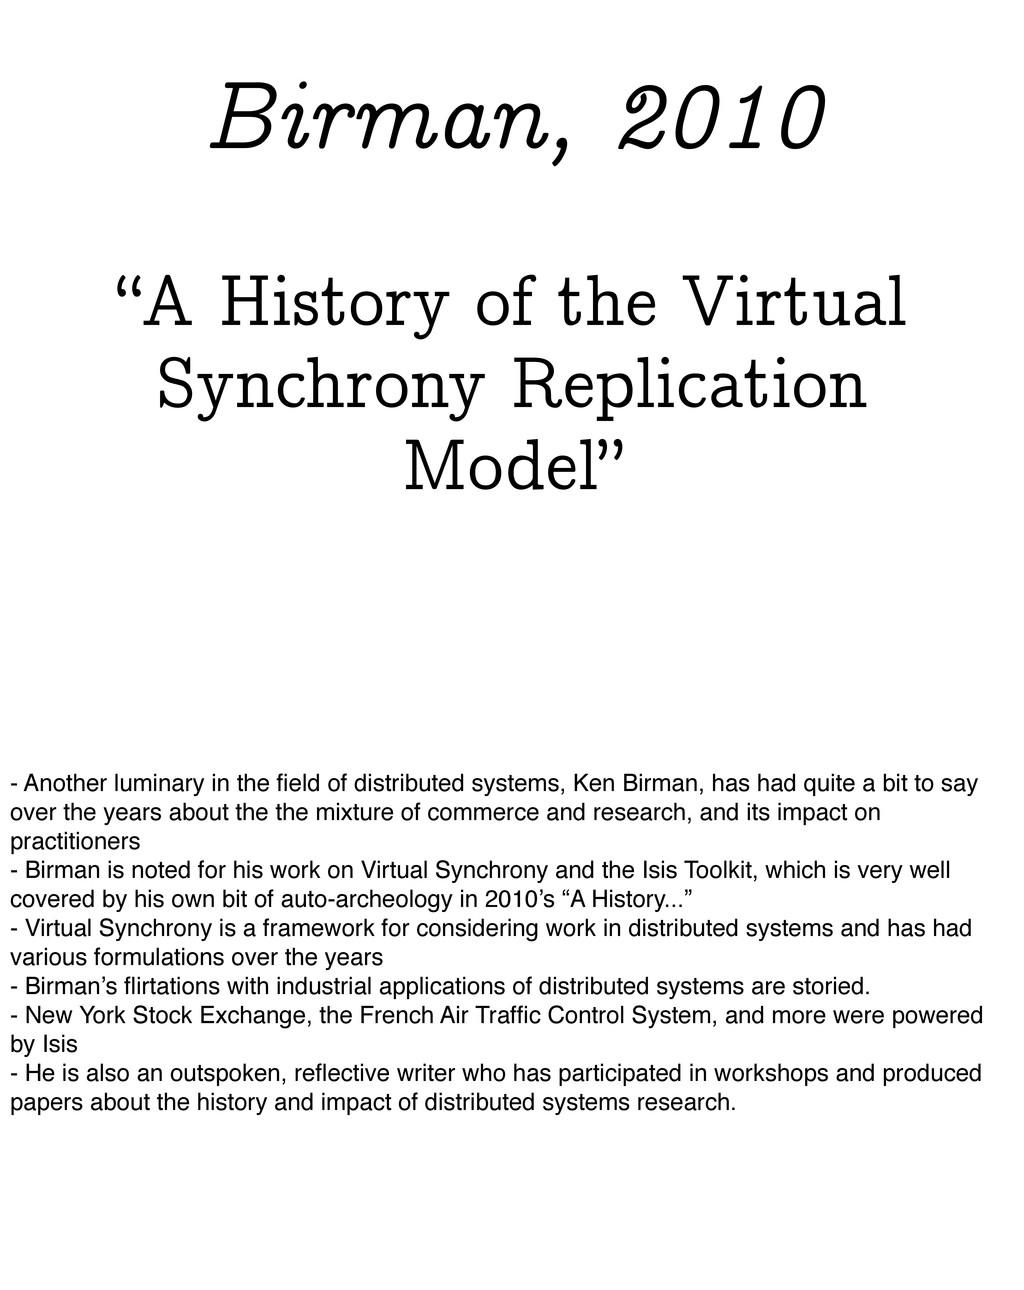 """A History of the Virtual Synchrony Replication..."